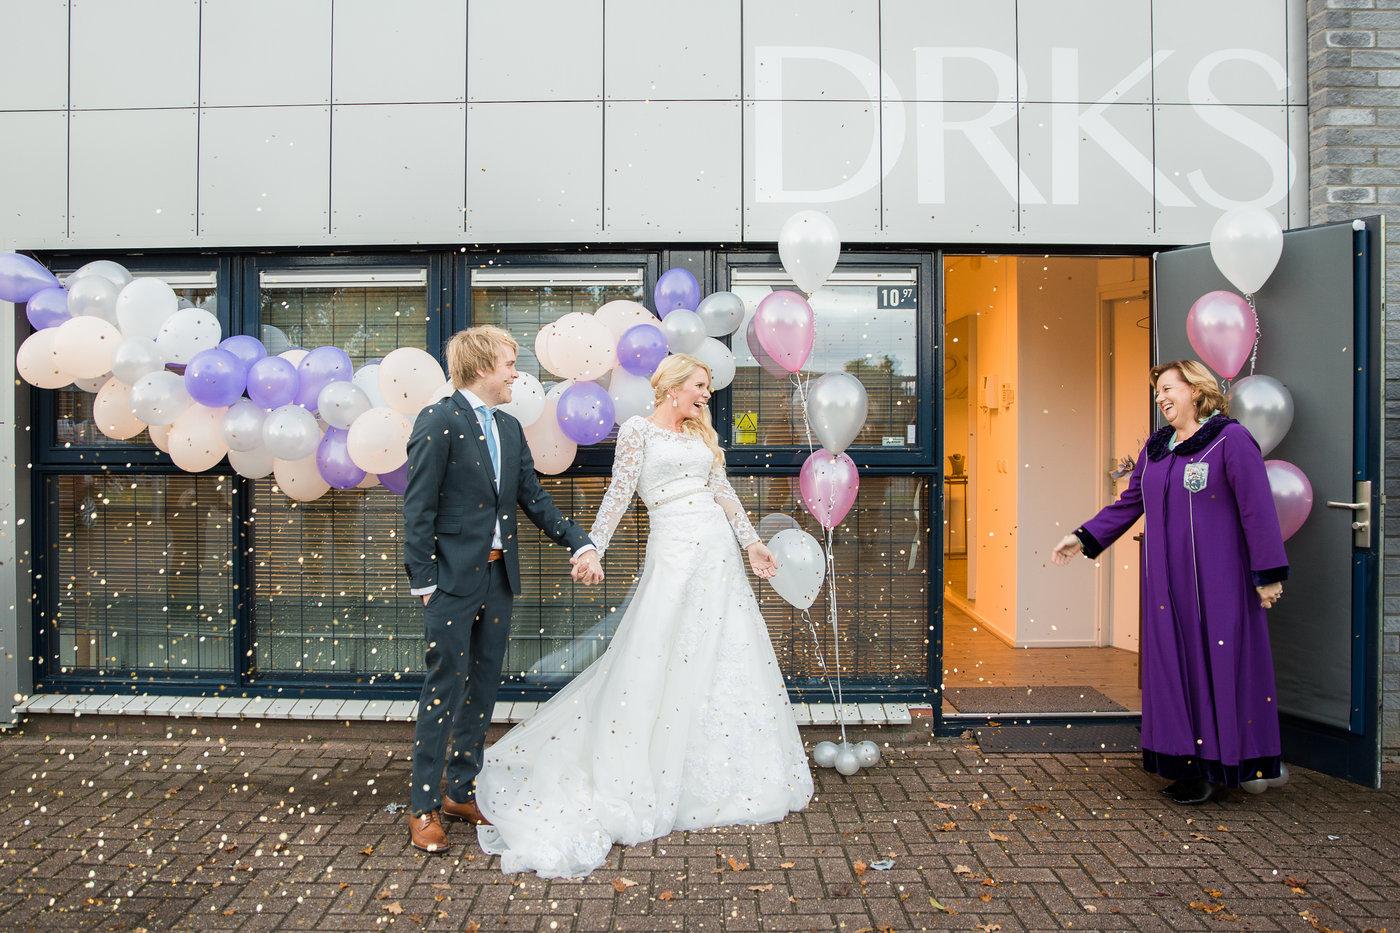 vrolijk bruidspaar met confetti